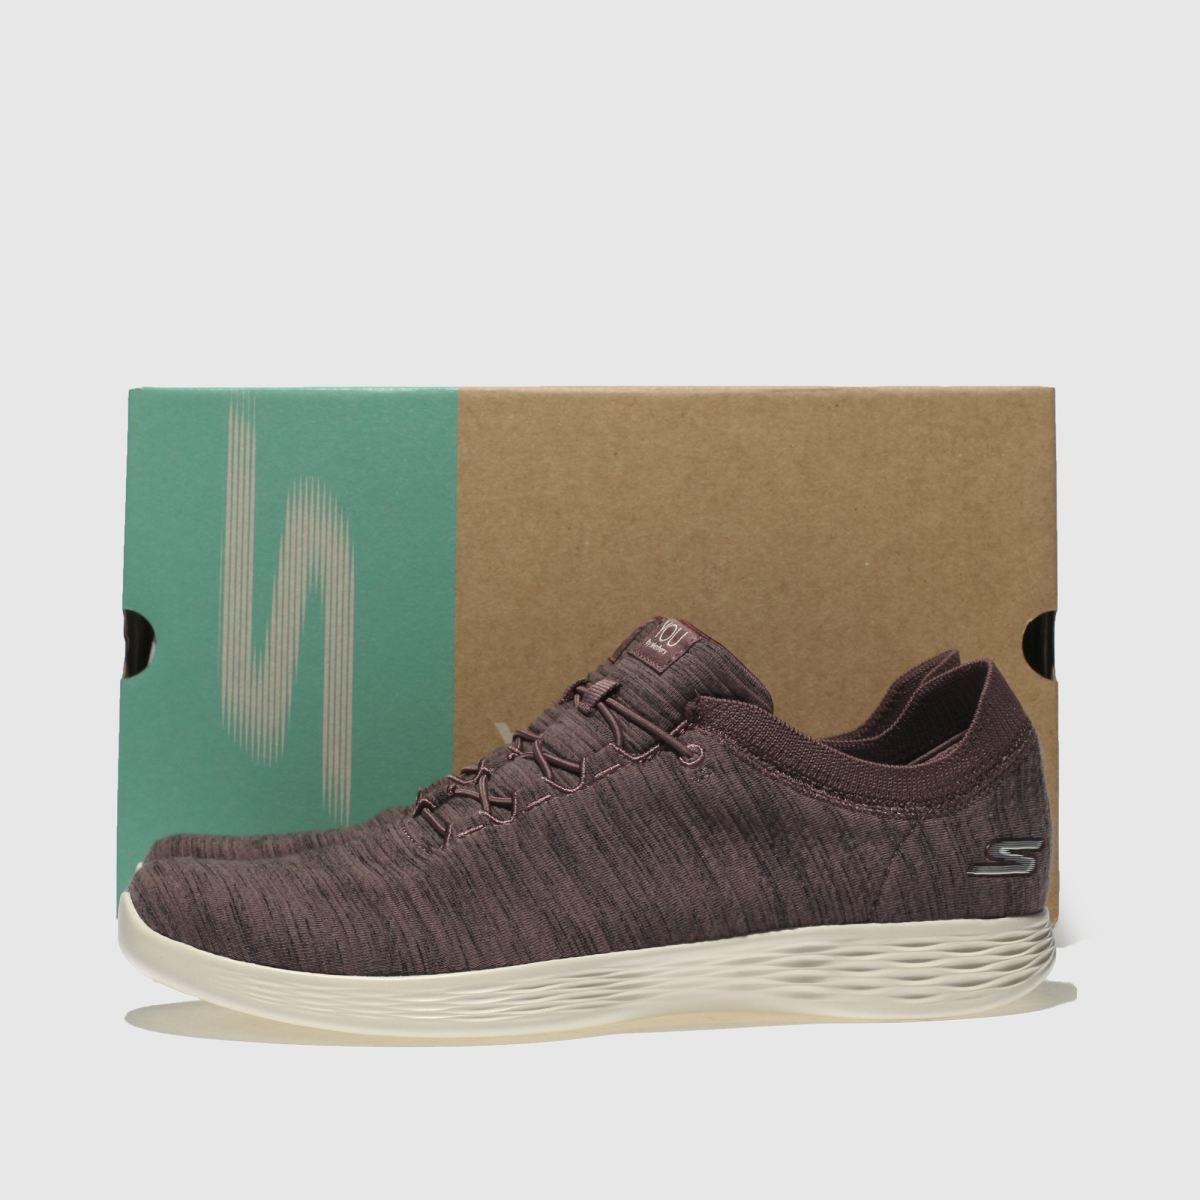 Damen Malve | skechers You Devine Sneaker | Malve schuh Gute Qualität beliebte Schuhe d343b0